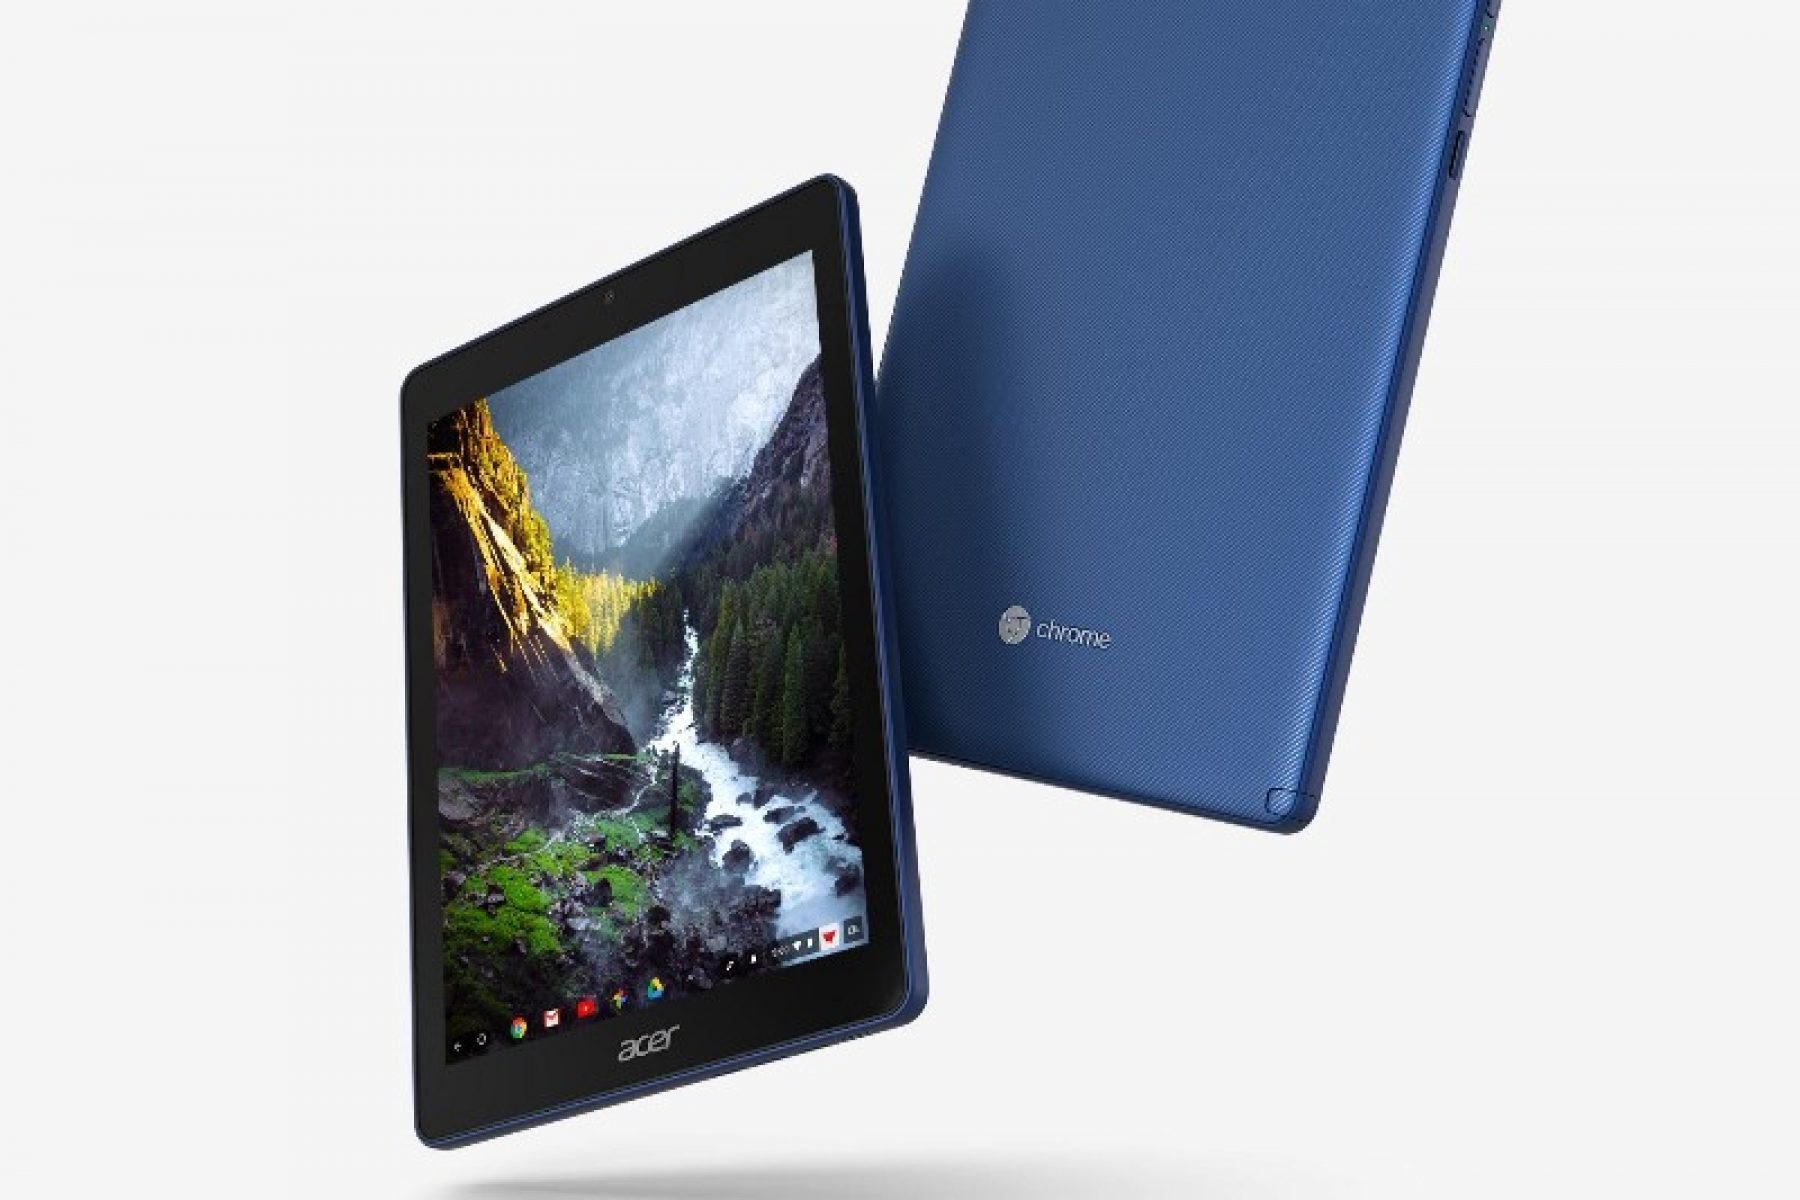 Acer-Chromebook-Tab-10-D651N_overview_design_large